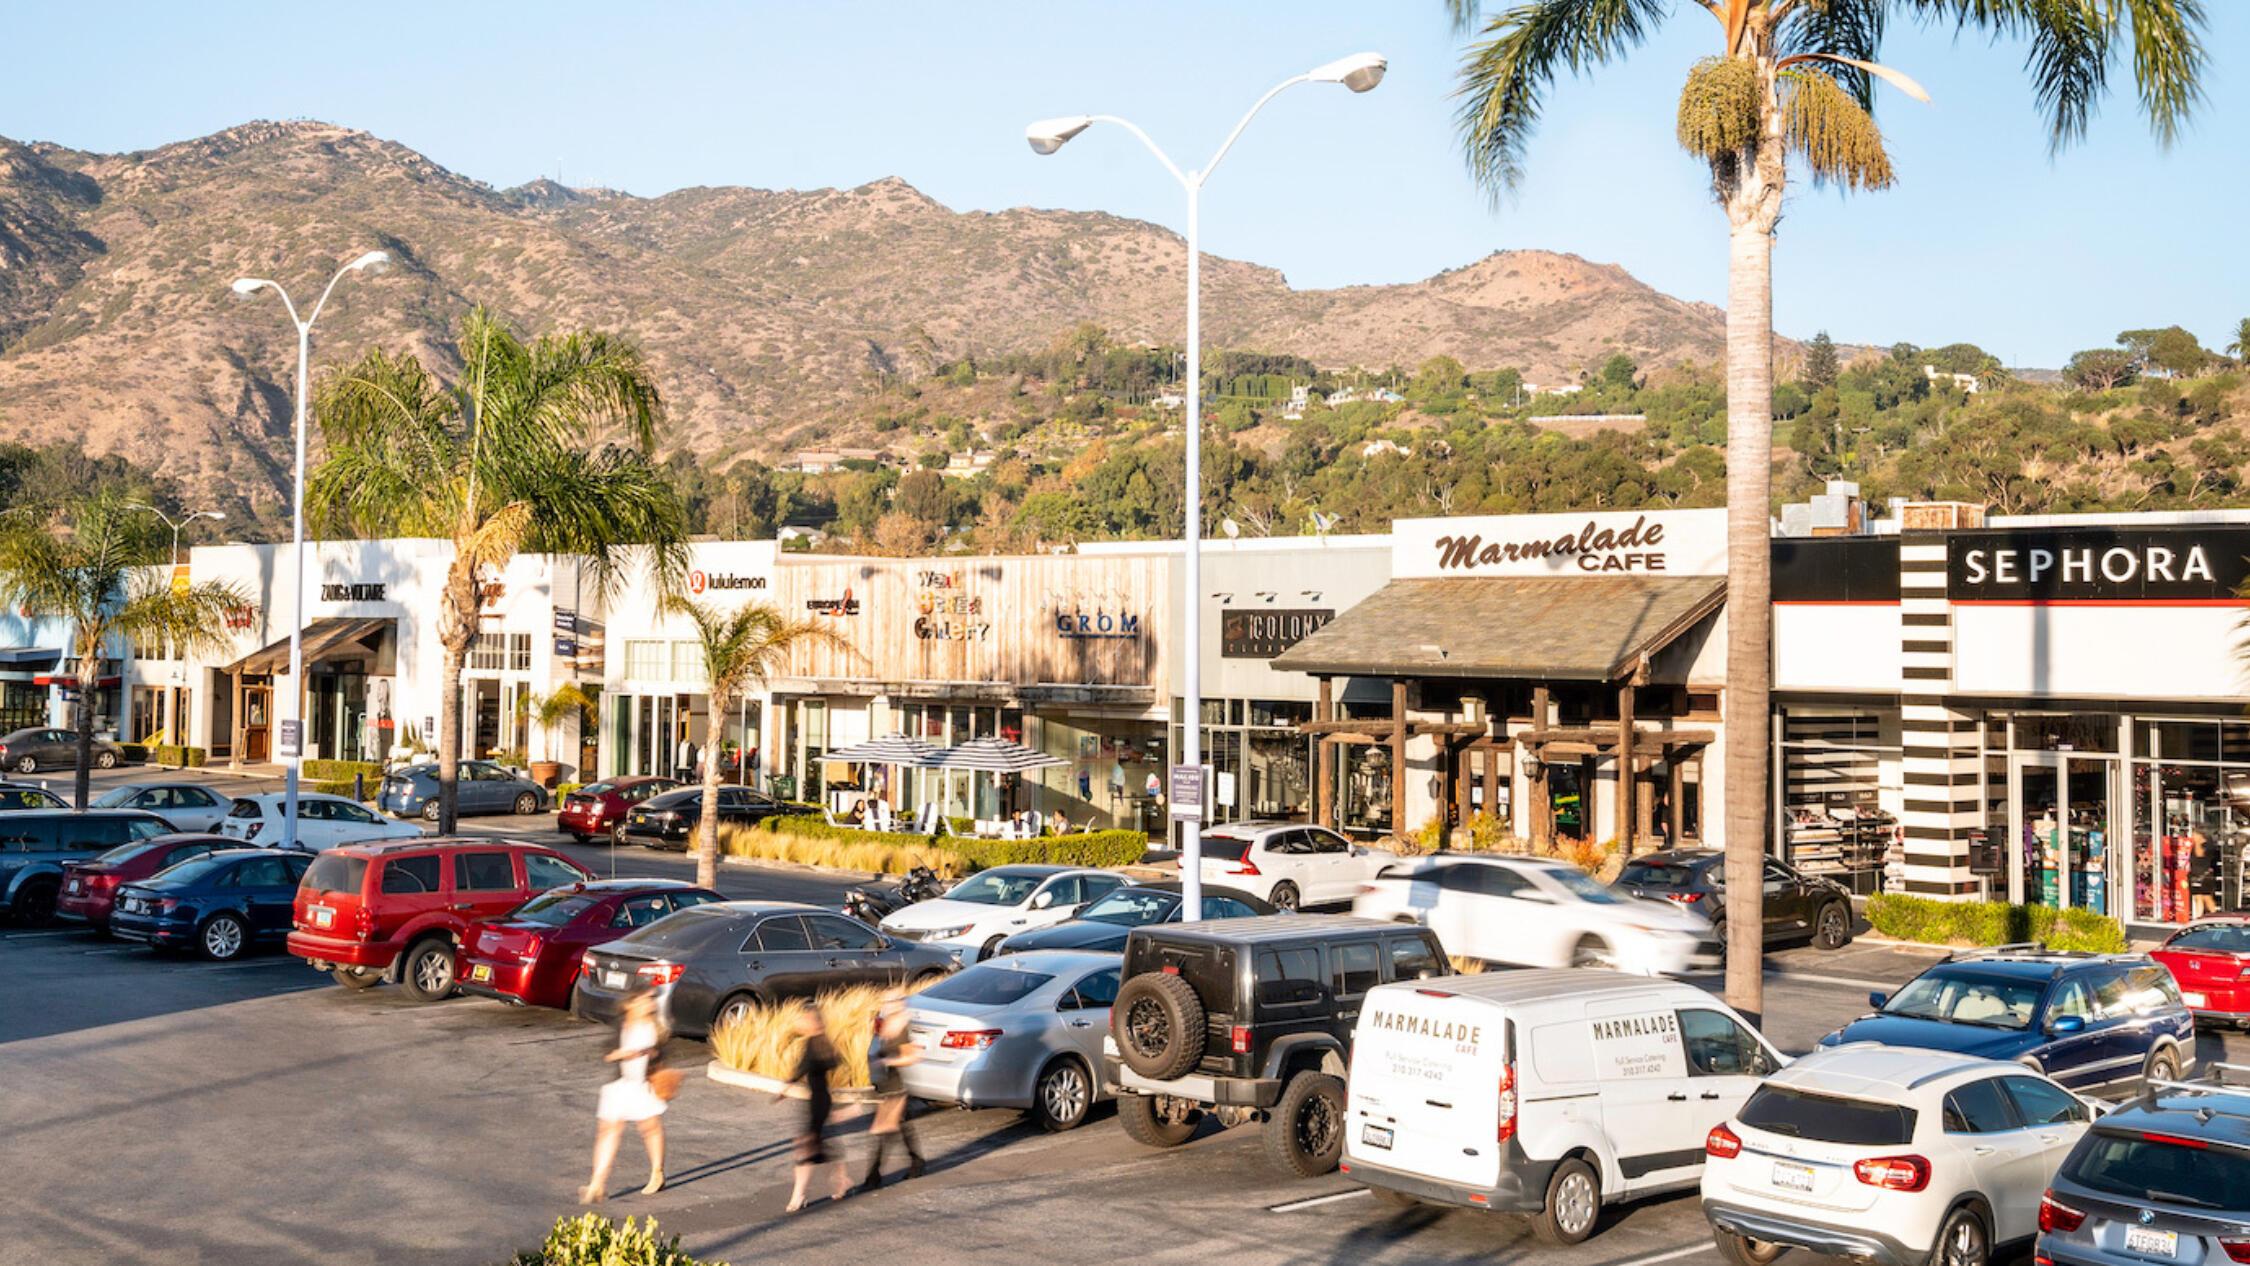 Shoppers walk through the parking lot at Malibu Village